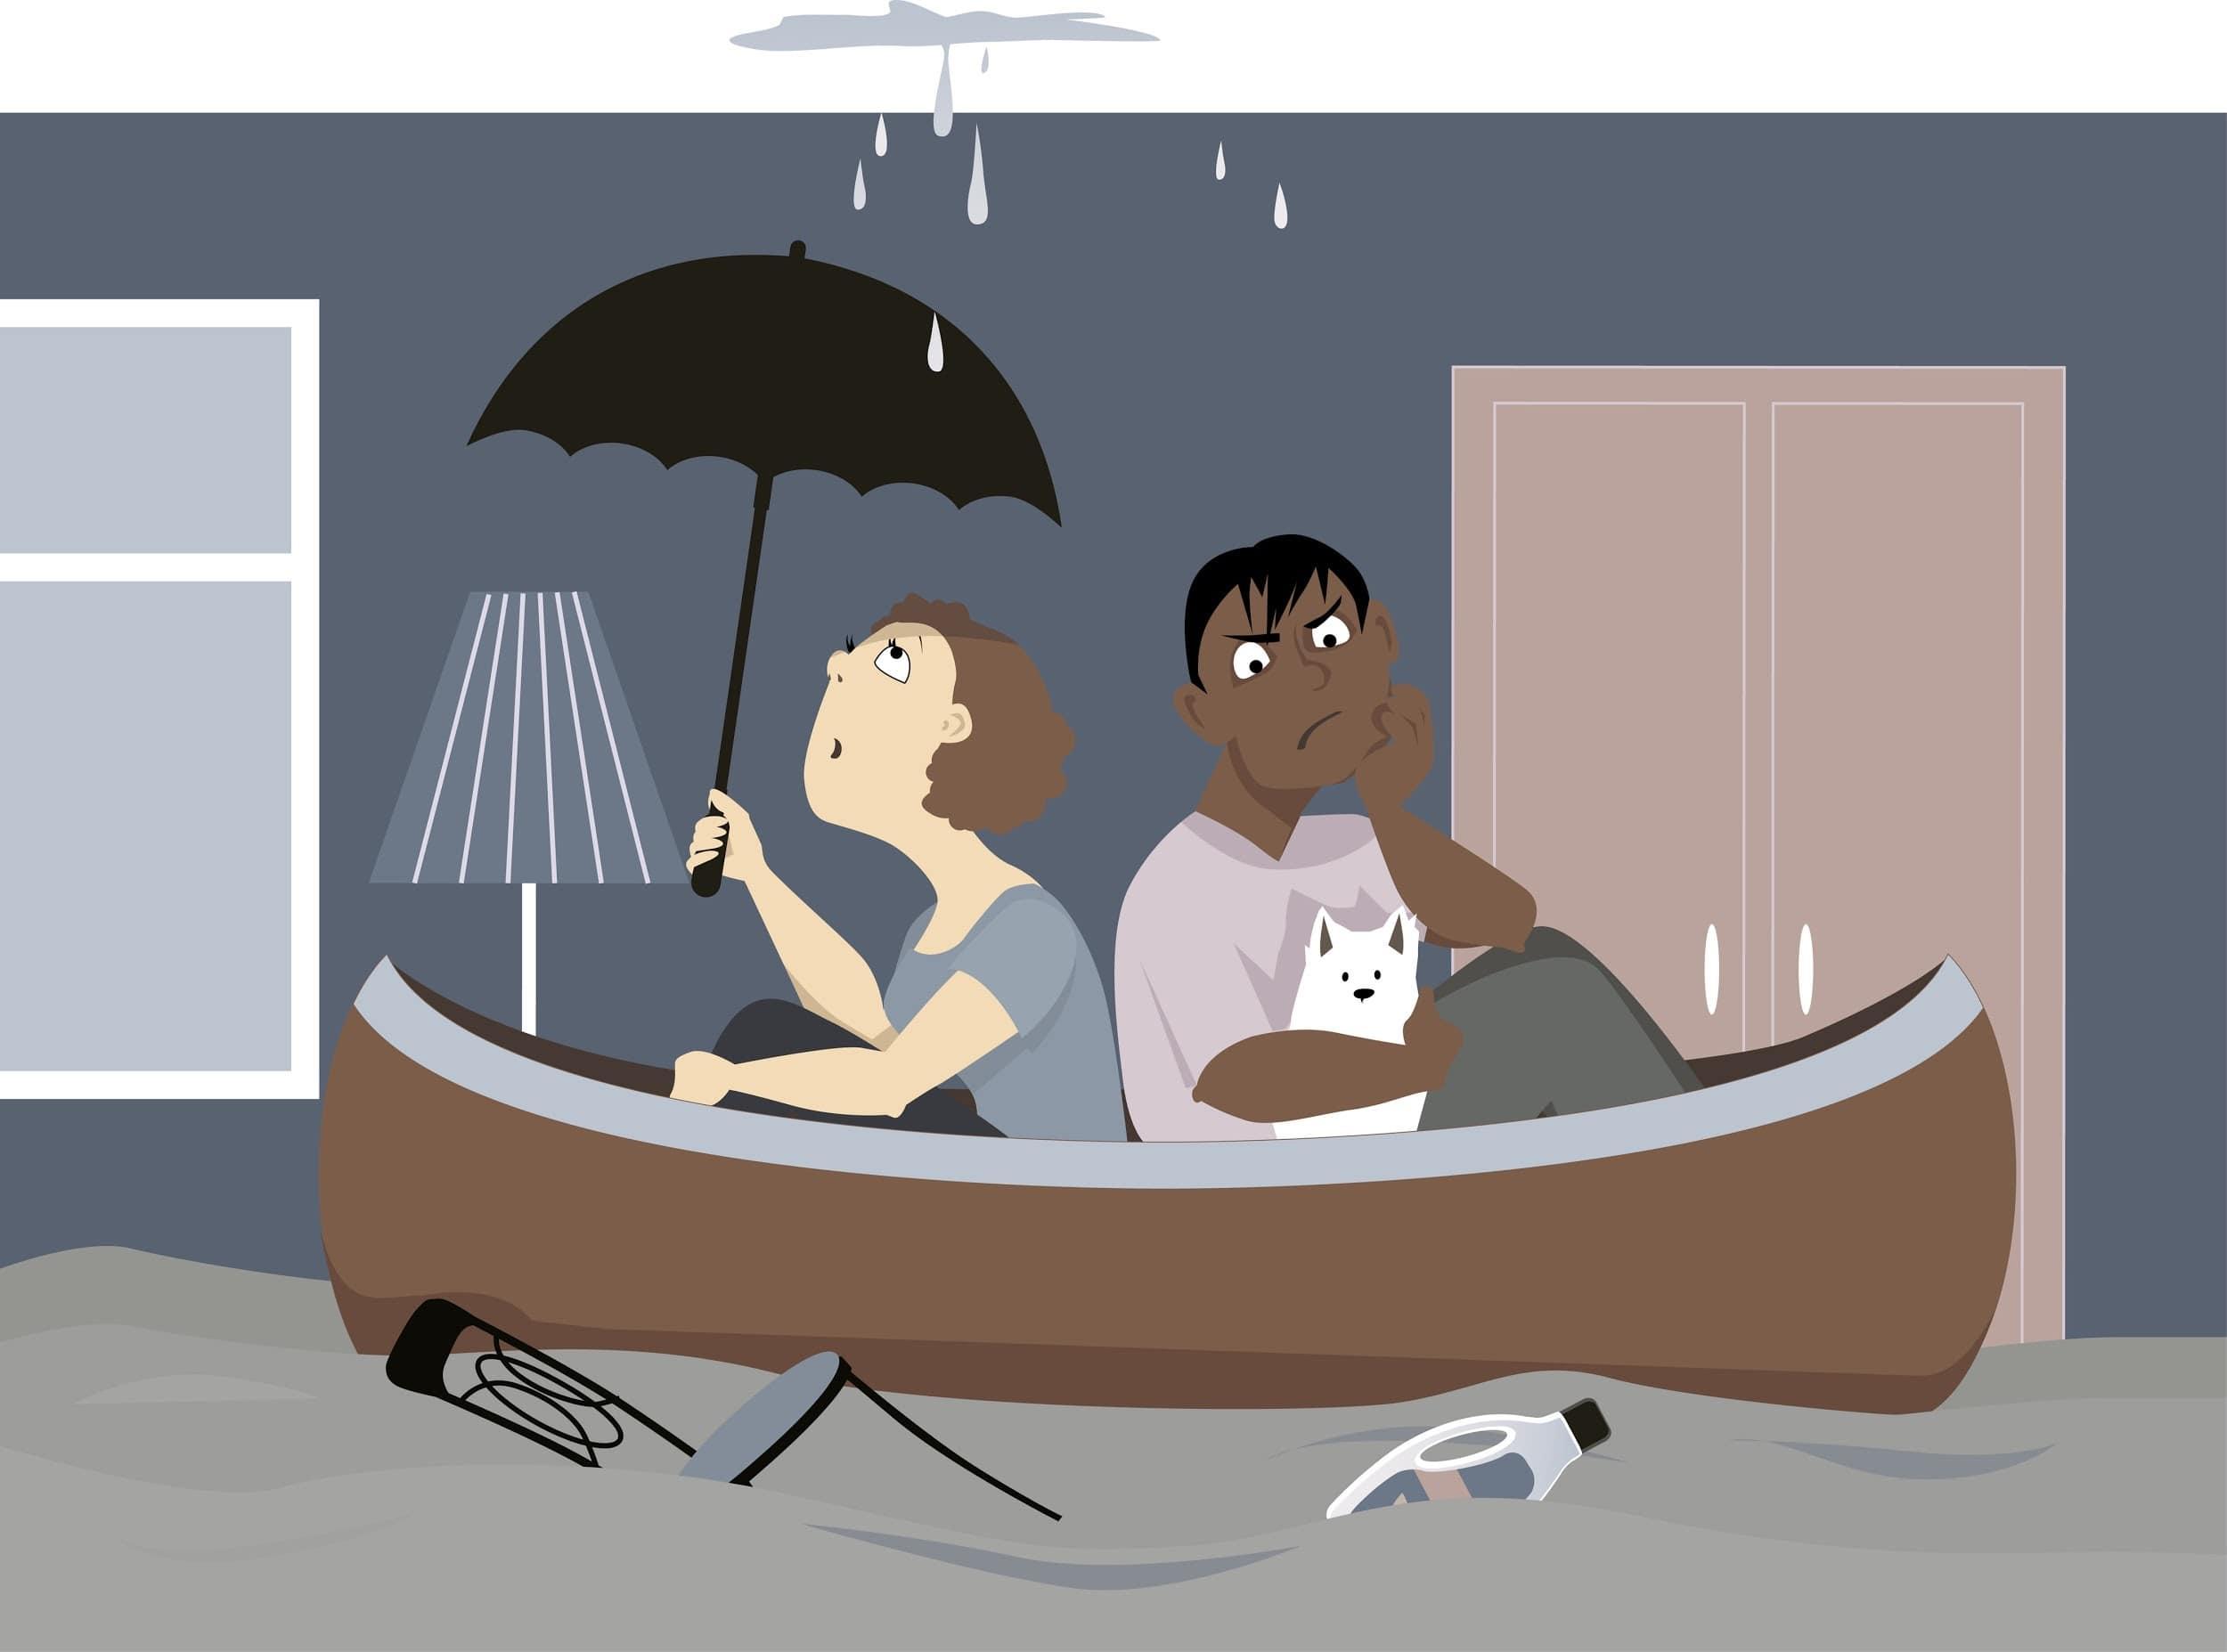 assurance-habitat-sinistre-degats-appartement-annexx.jpg